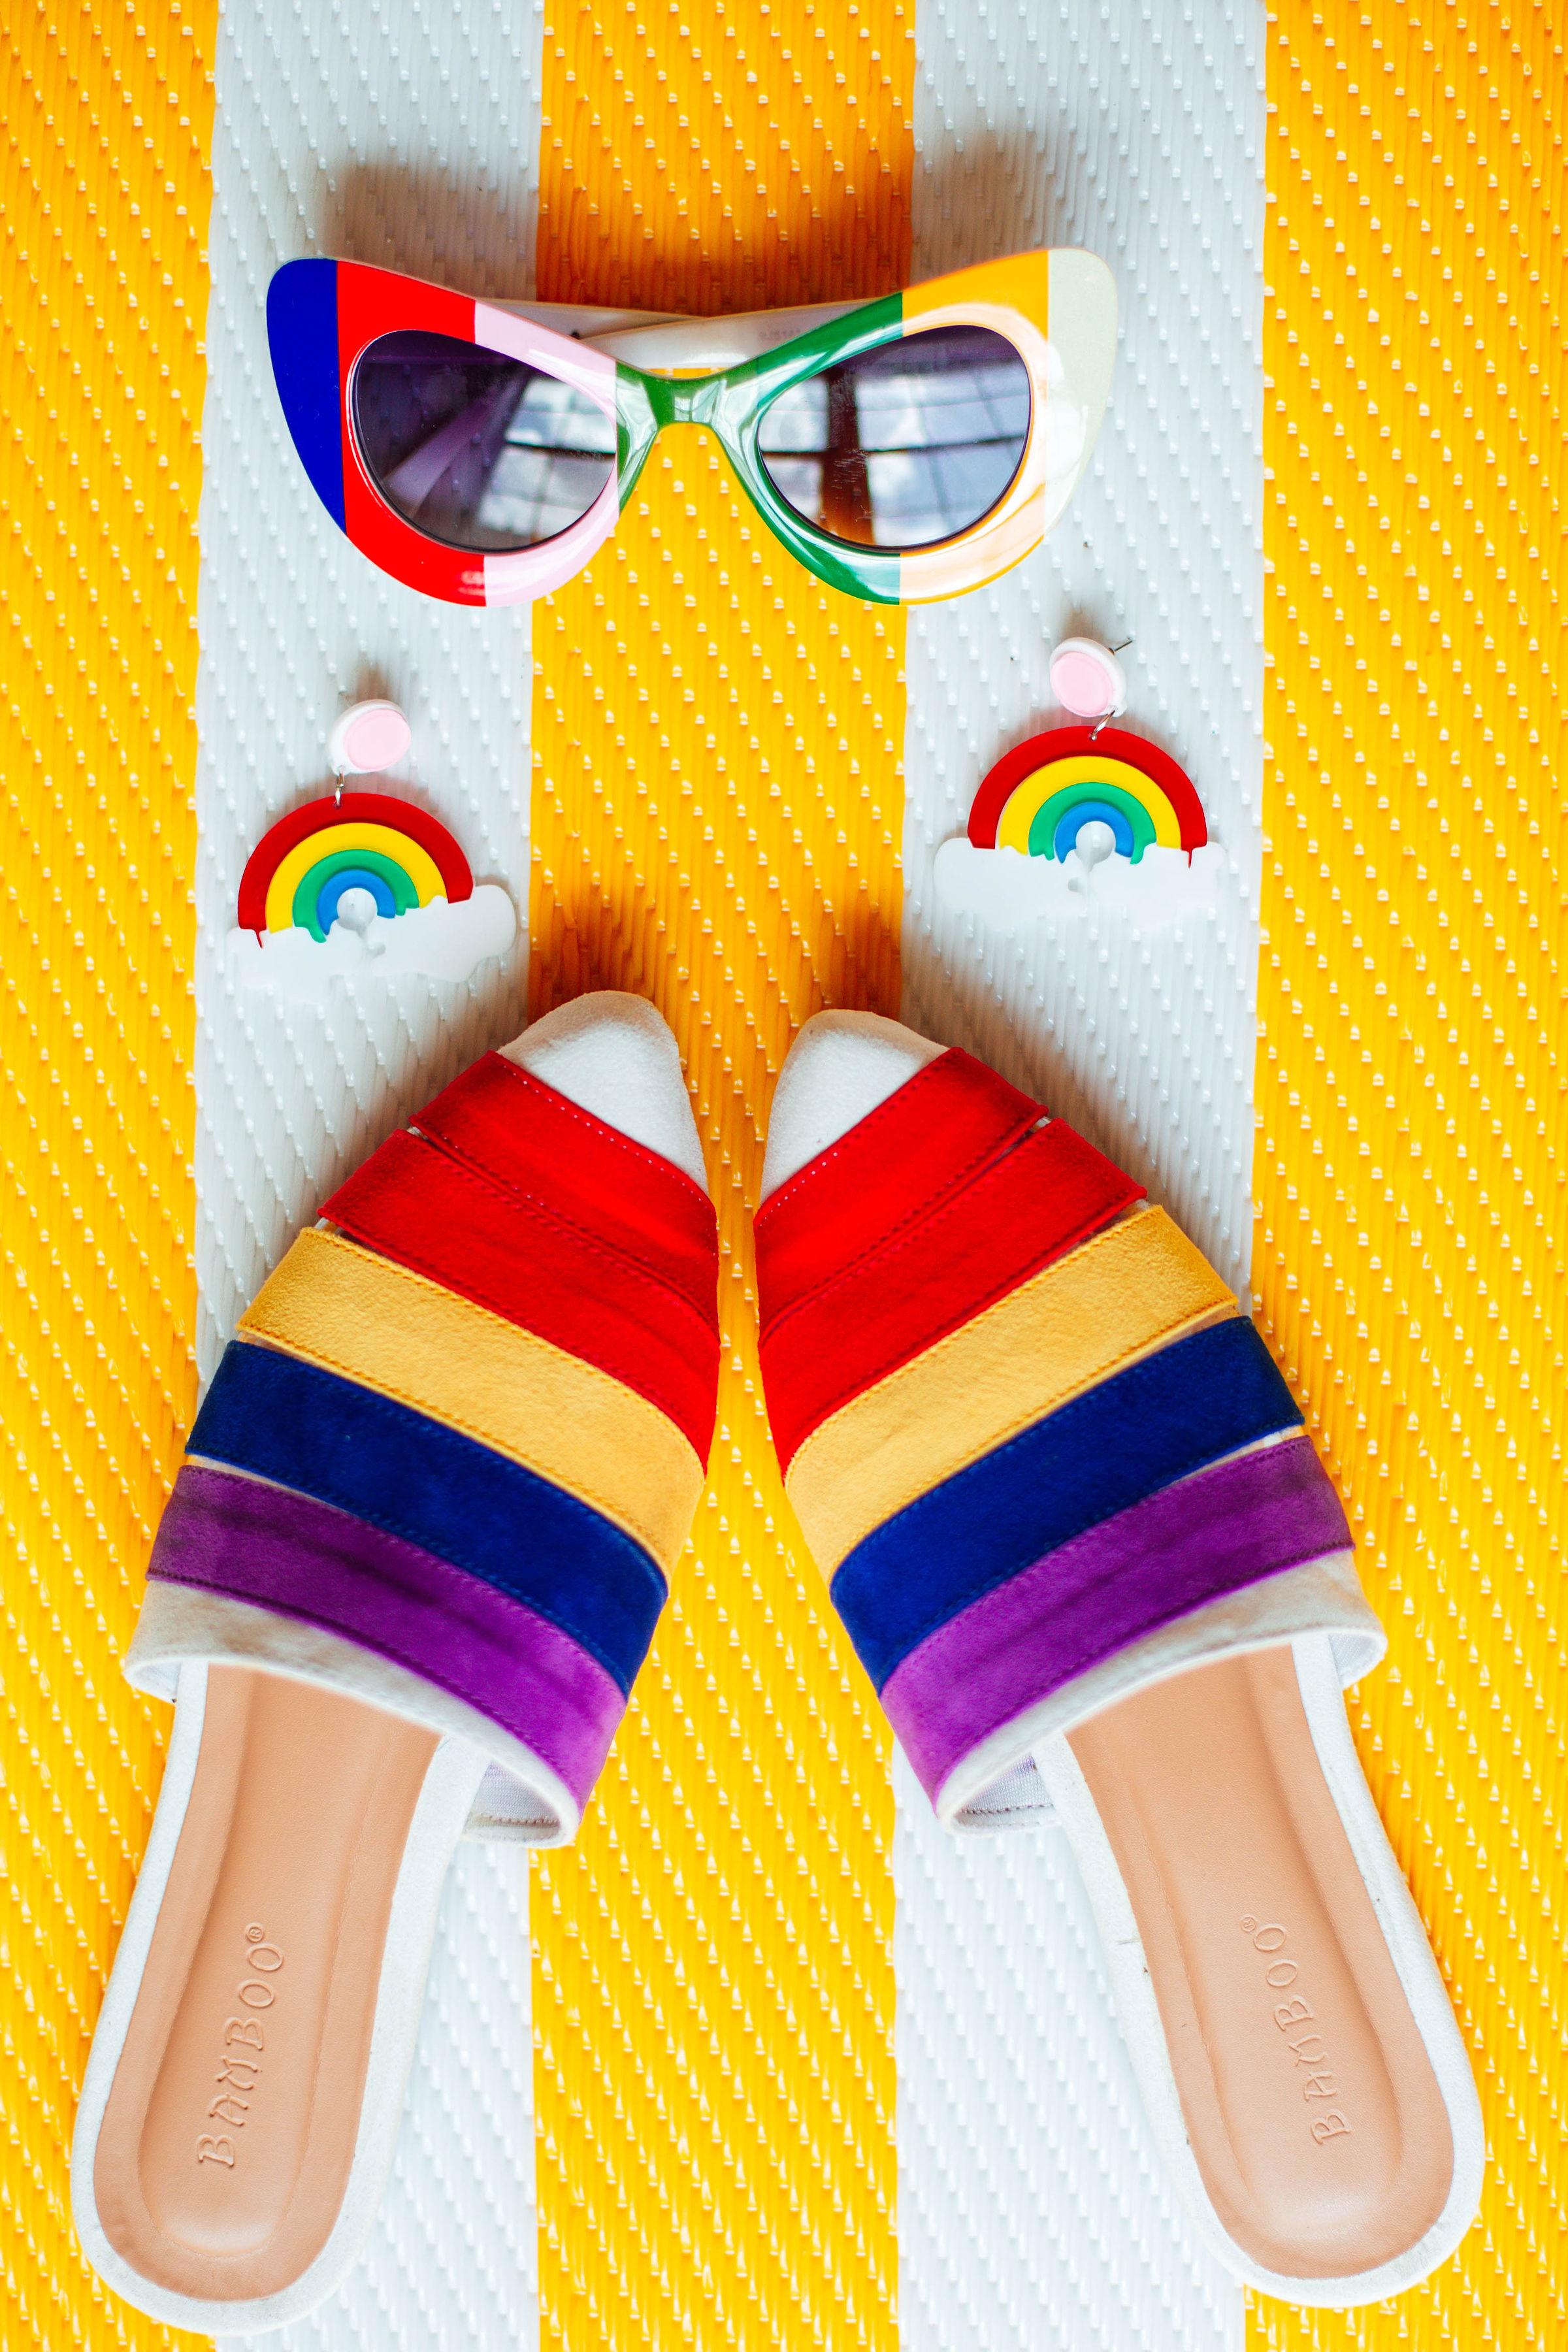 Items:  Rainbow Retro Sunnies ;  Somewhere Over the Rainbow Earrings ;  Flat Out Rainbow Pointed Flats